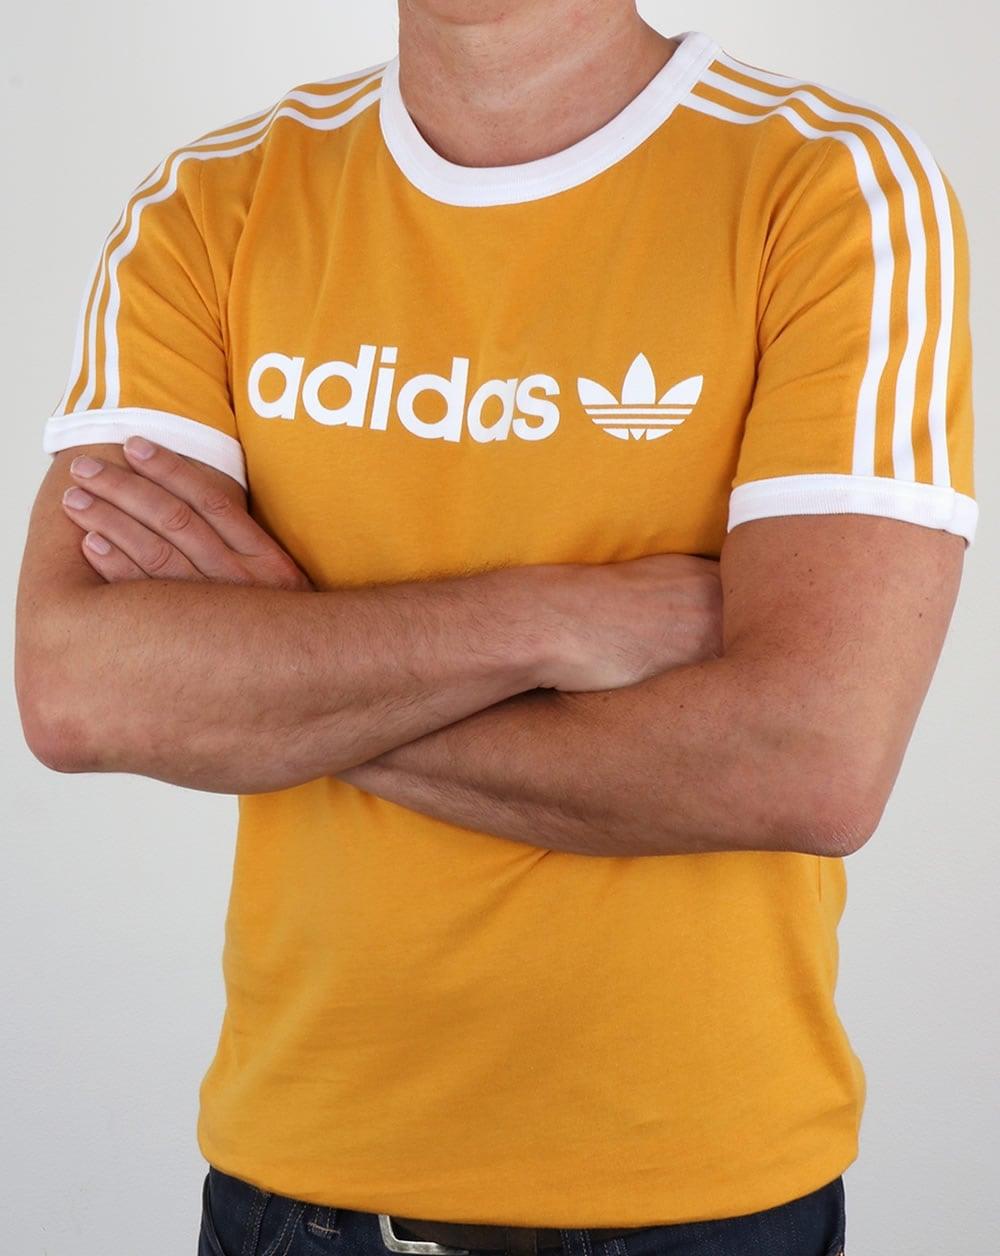 adidas Trefoil Tactile Yellow T Shirt